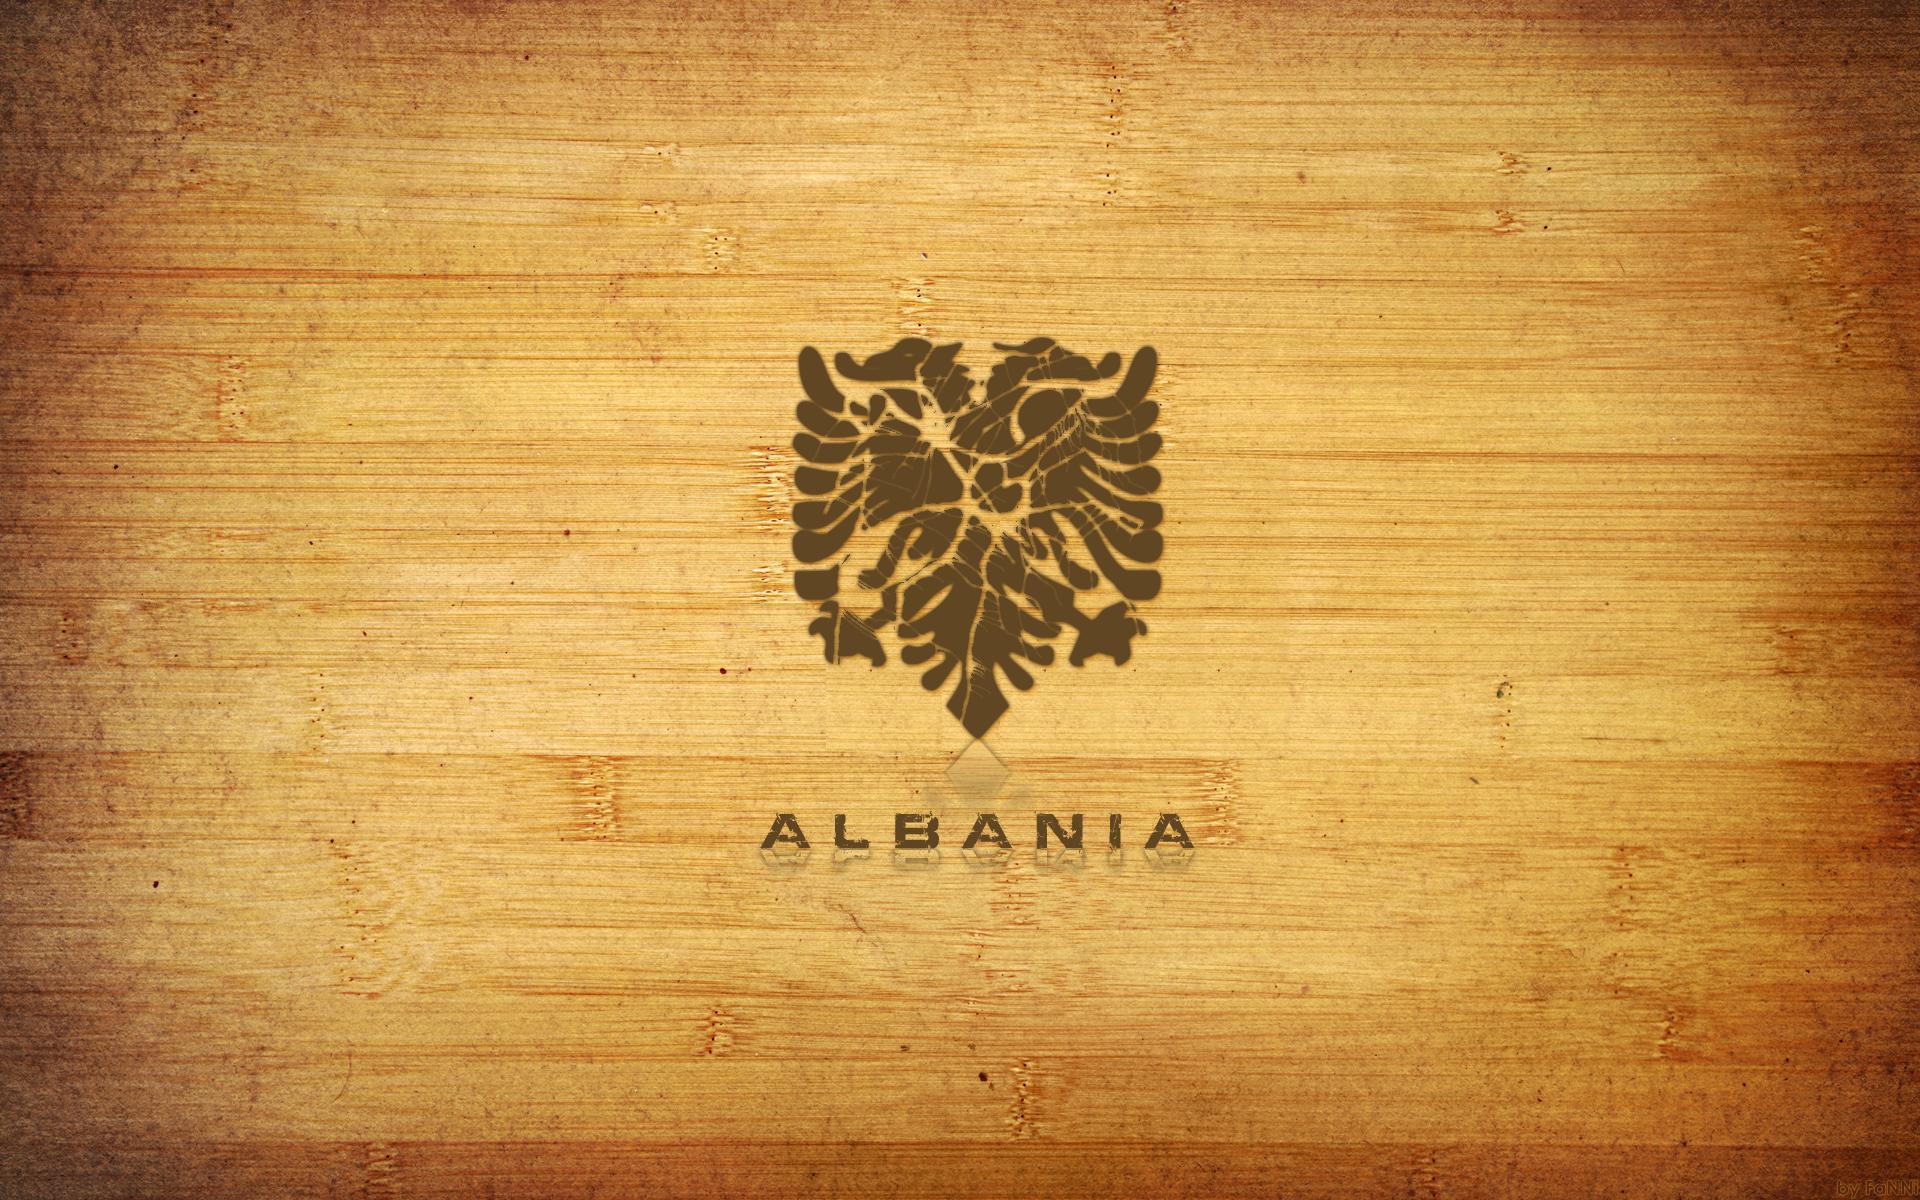 Albania Wallpaper Hd Albania Wallpapers Wallpaper Cave